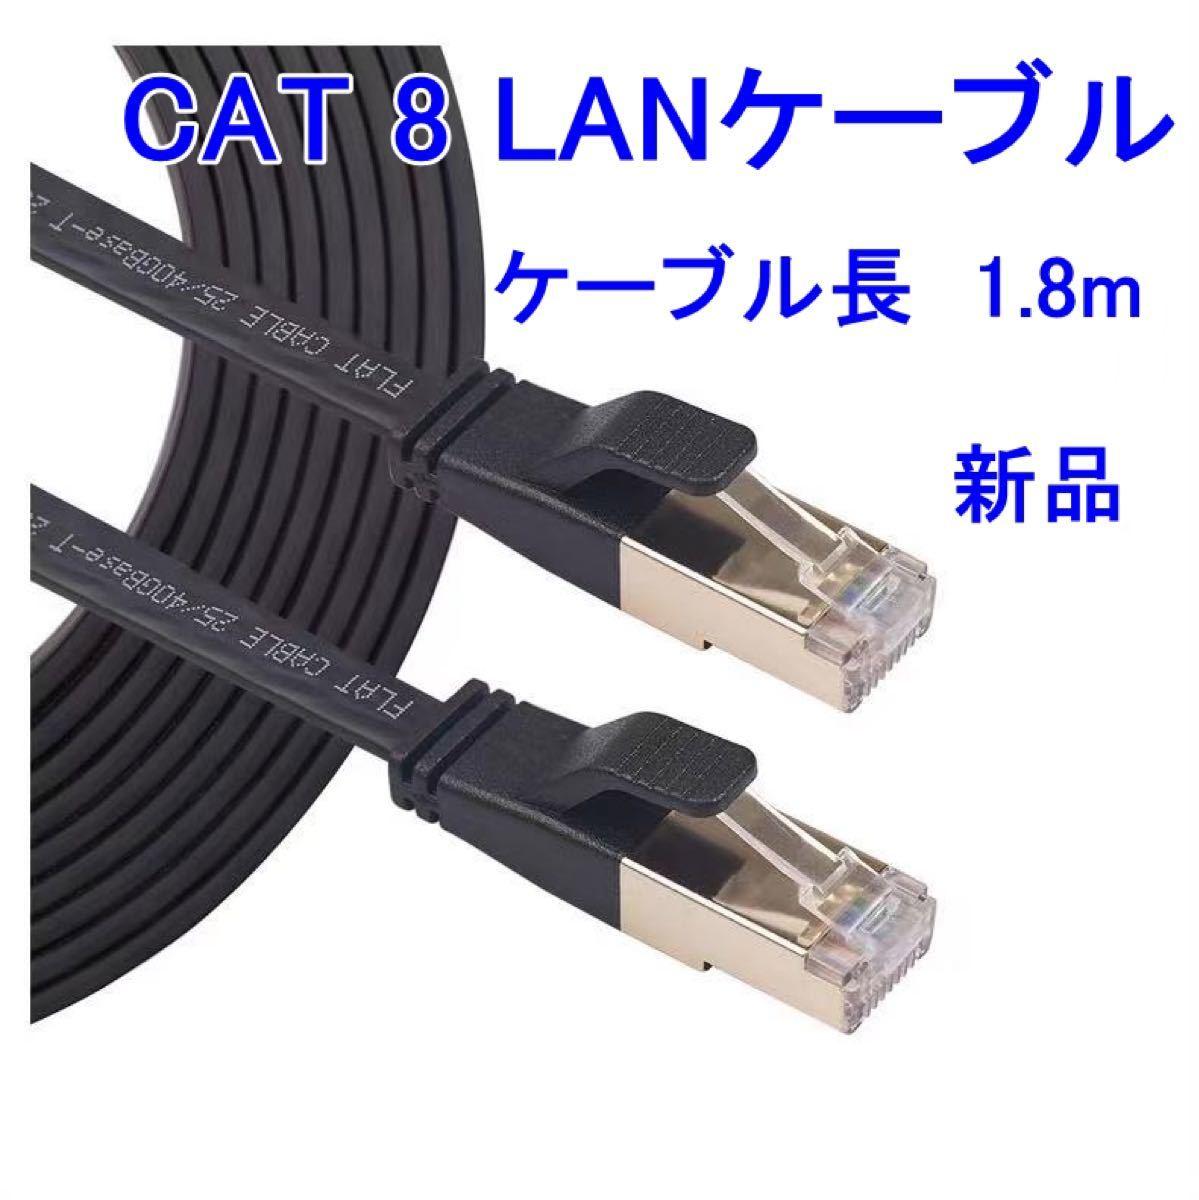 LANケーブル CAT8 1.8m RJ45 40ギガビット 高速光通信対応